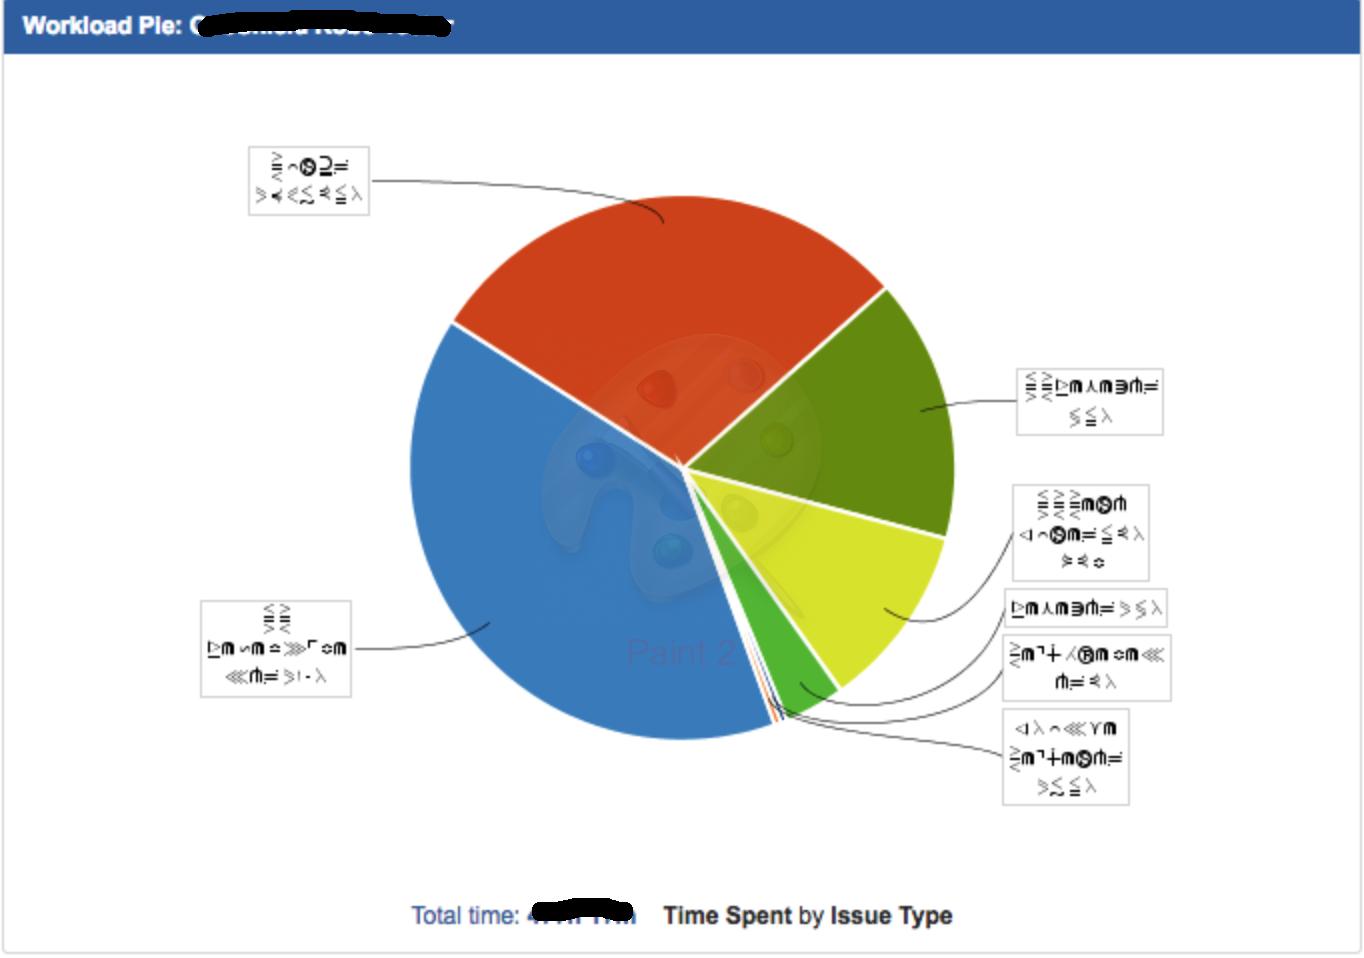 Workload Pie Chart Showing Unreadable Characters Atlassian